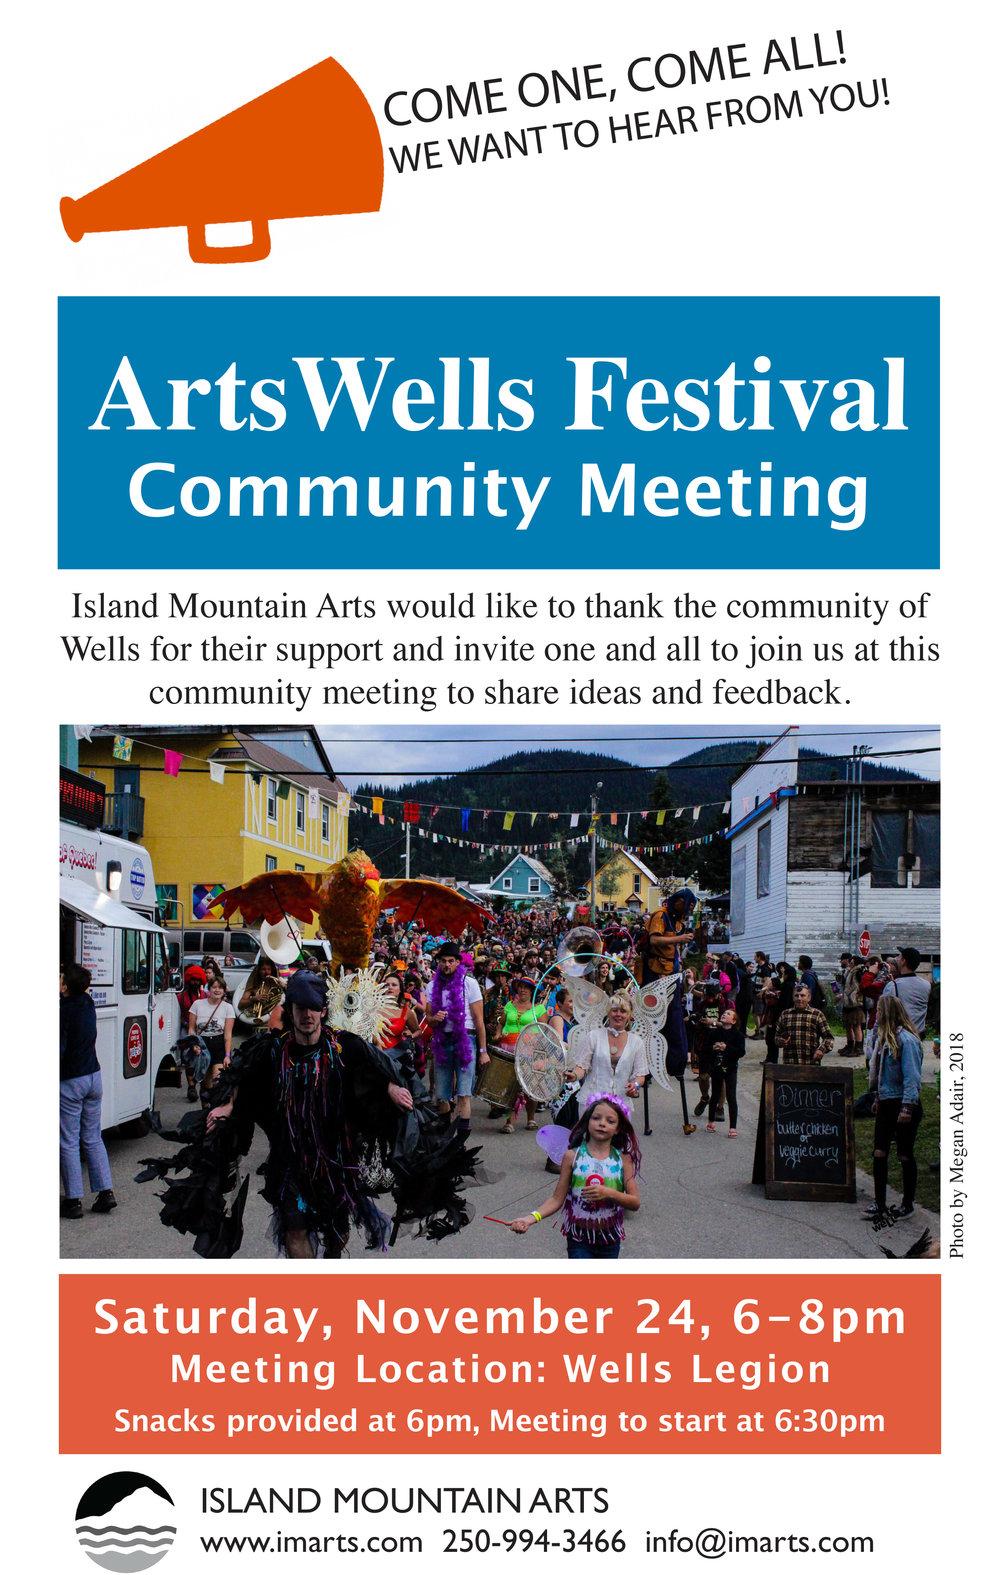 ArtsWells2018CommunityMeeting.jpg